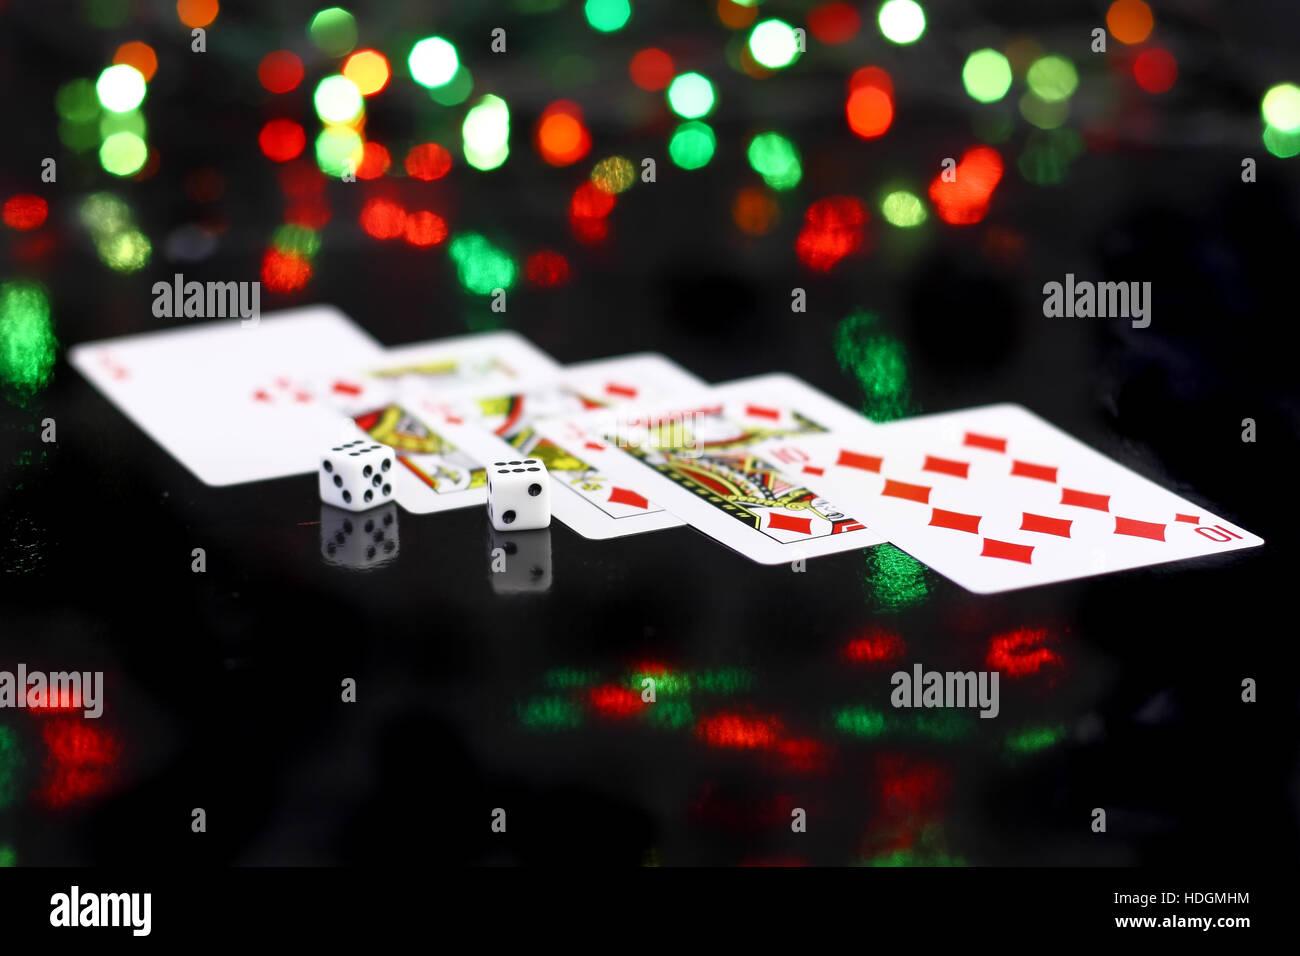 Casino flesh productos de procter & gamble